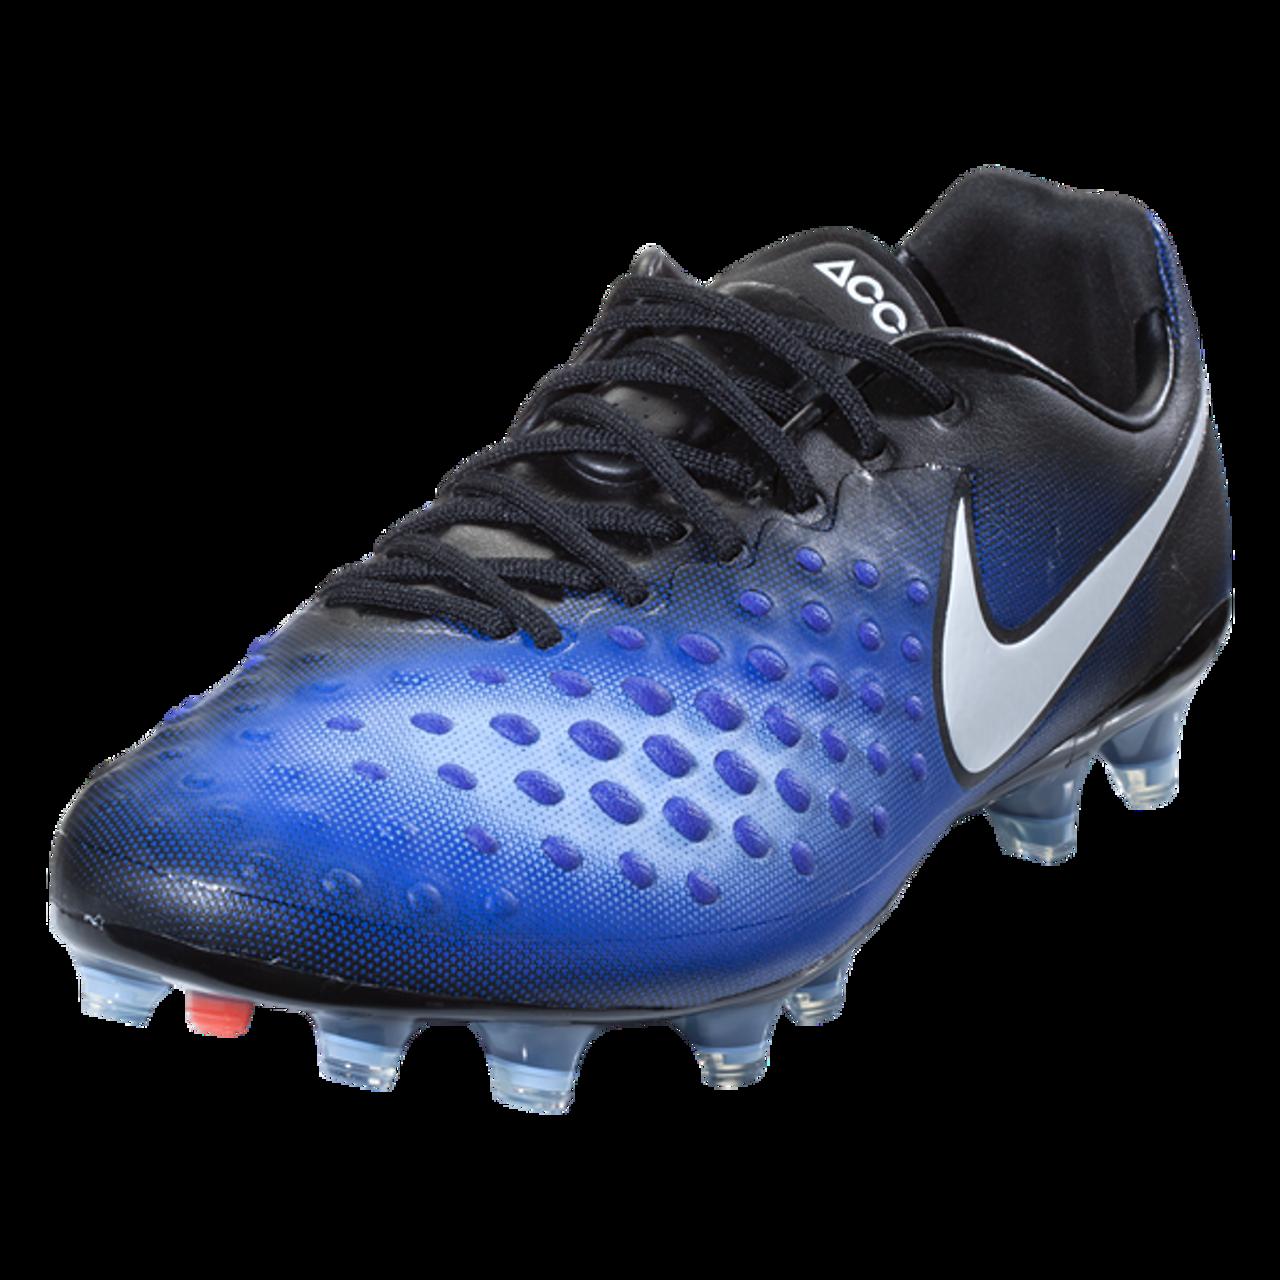 280b297d6892d Nike Magista Opus II FG - Black/White/Paramount Blue/Aluminum (052519) -  ohp soccer